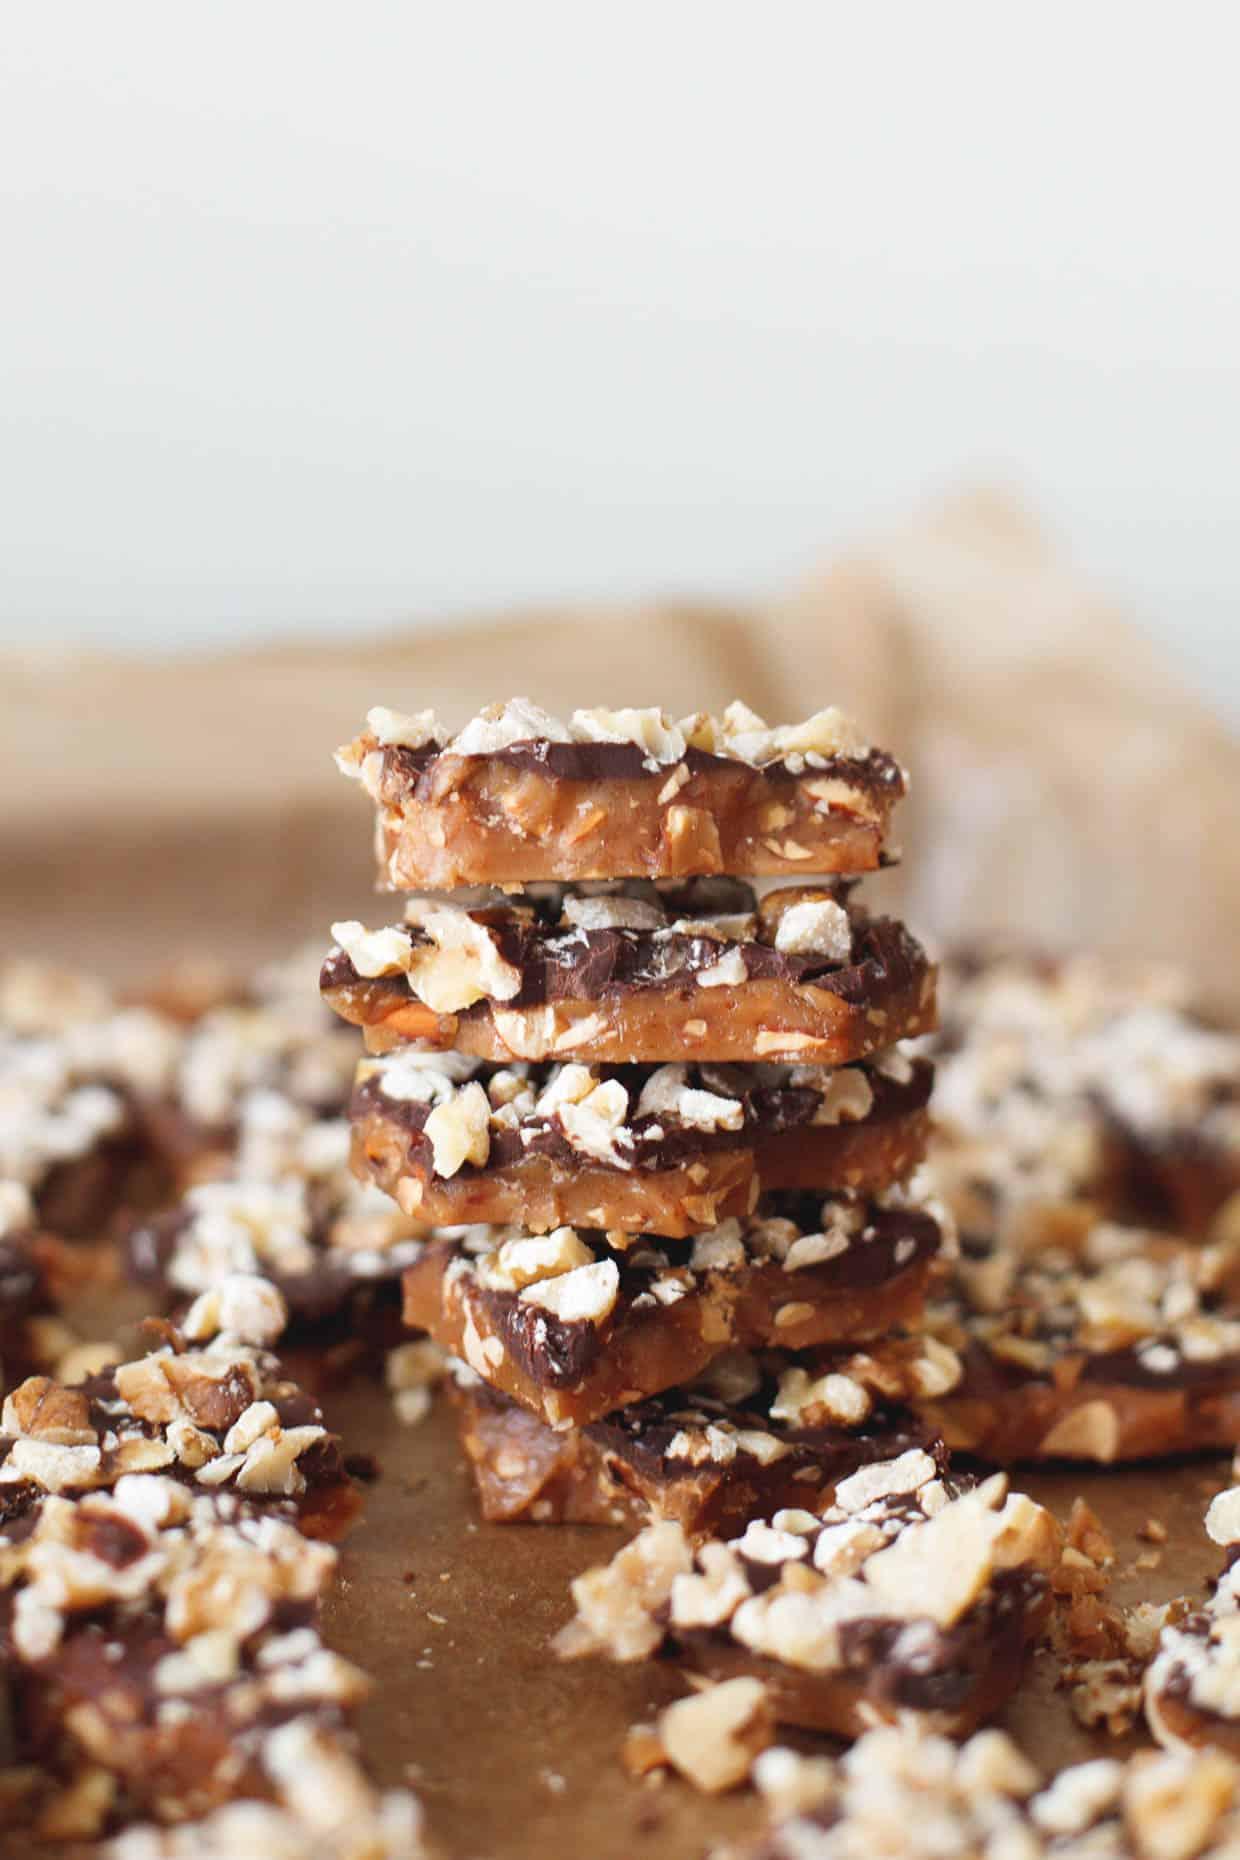 Chocolate Almond English Toffee